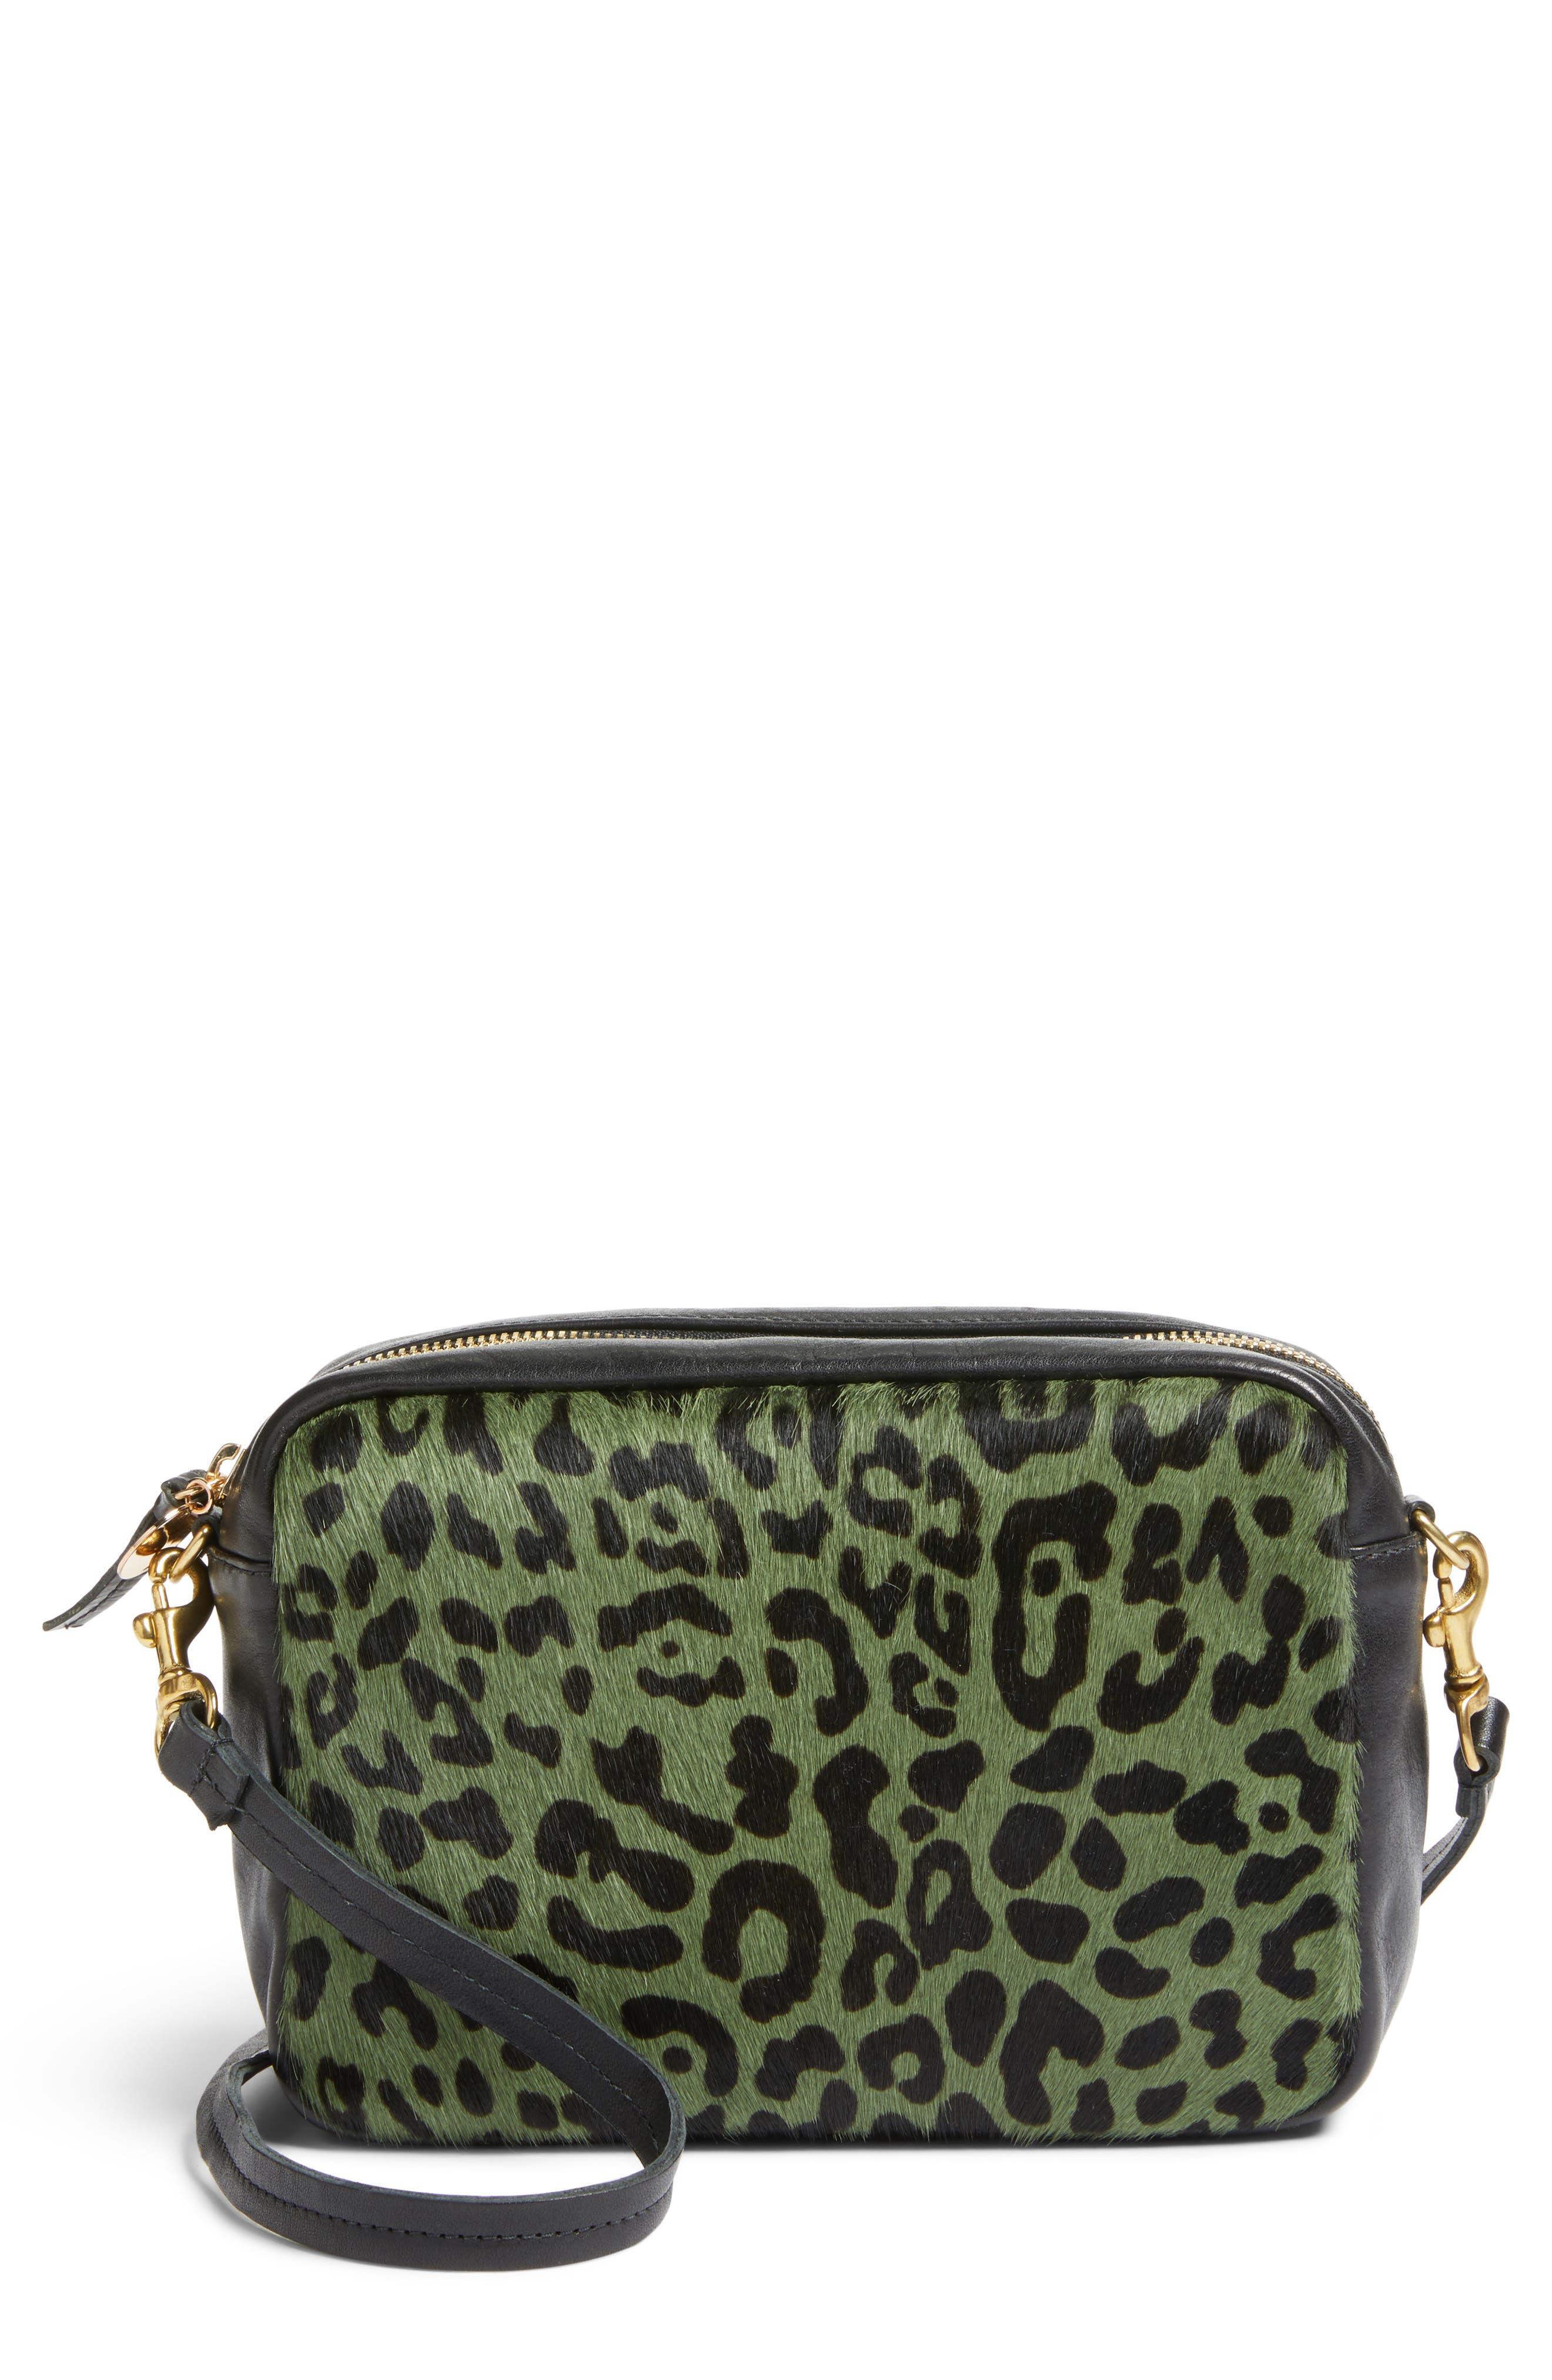 Midi Sac Leather & Genuine Calf Hair Shoulder Bag,                         Main,                         color, Agave Leopard